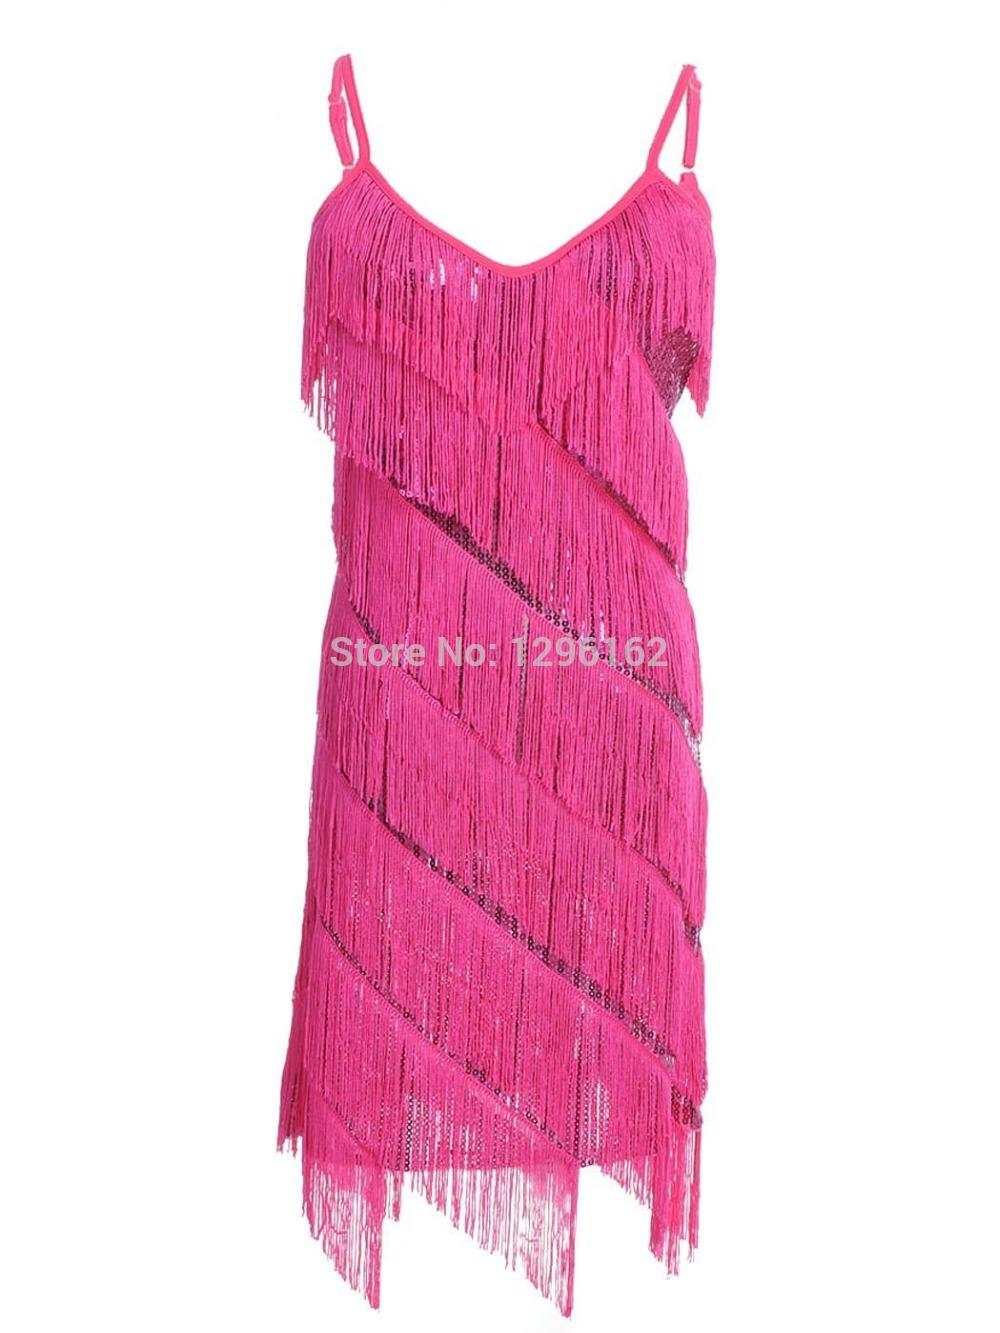 Women's Dress 1920s Swing Sequins Flapper Costume Tassel Dresses FN604(China (Mainland))